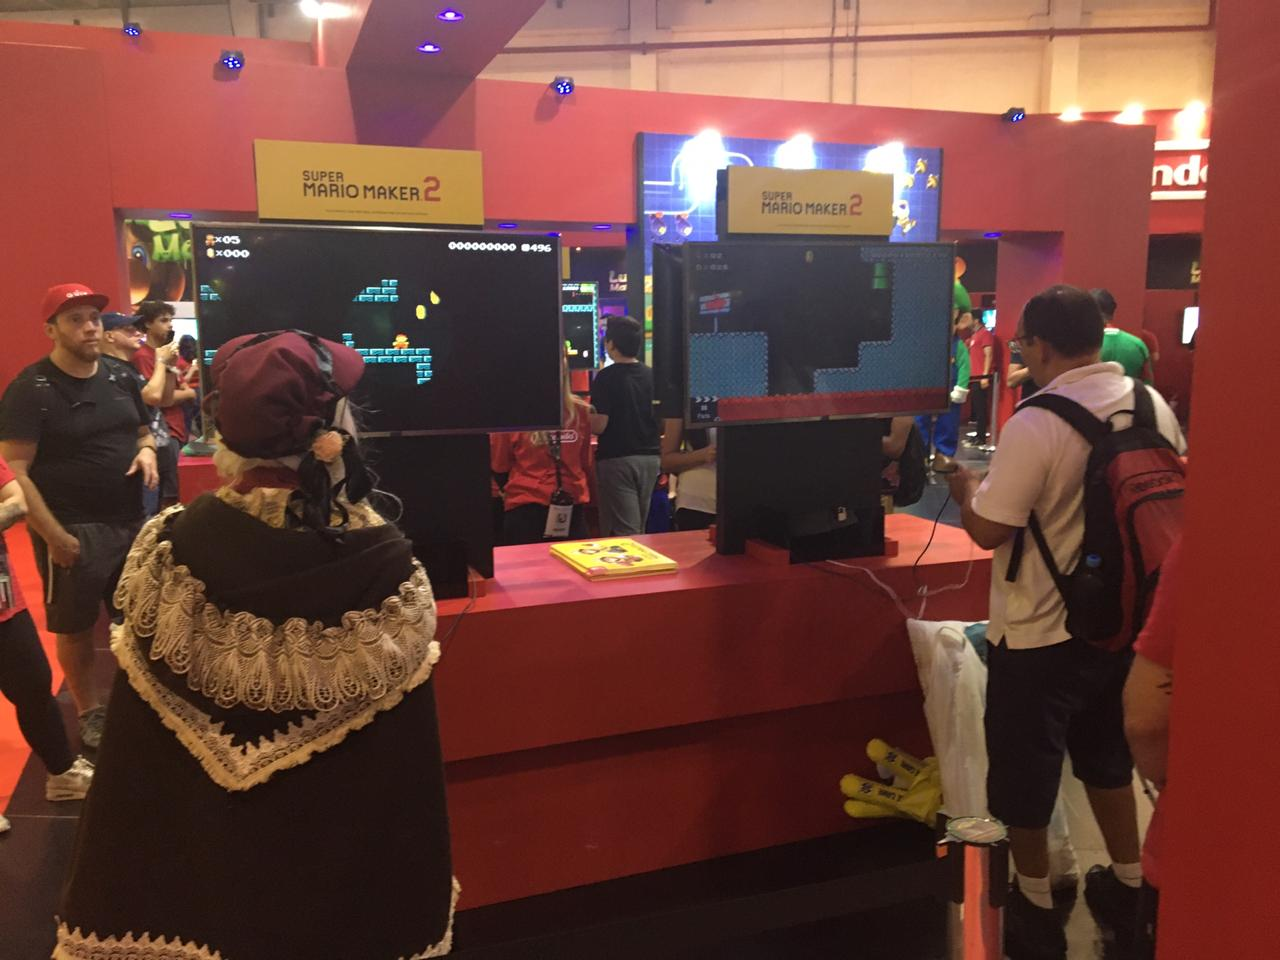 Super Mario Maker 2 esteve disponível para jogar na BGS 2019